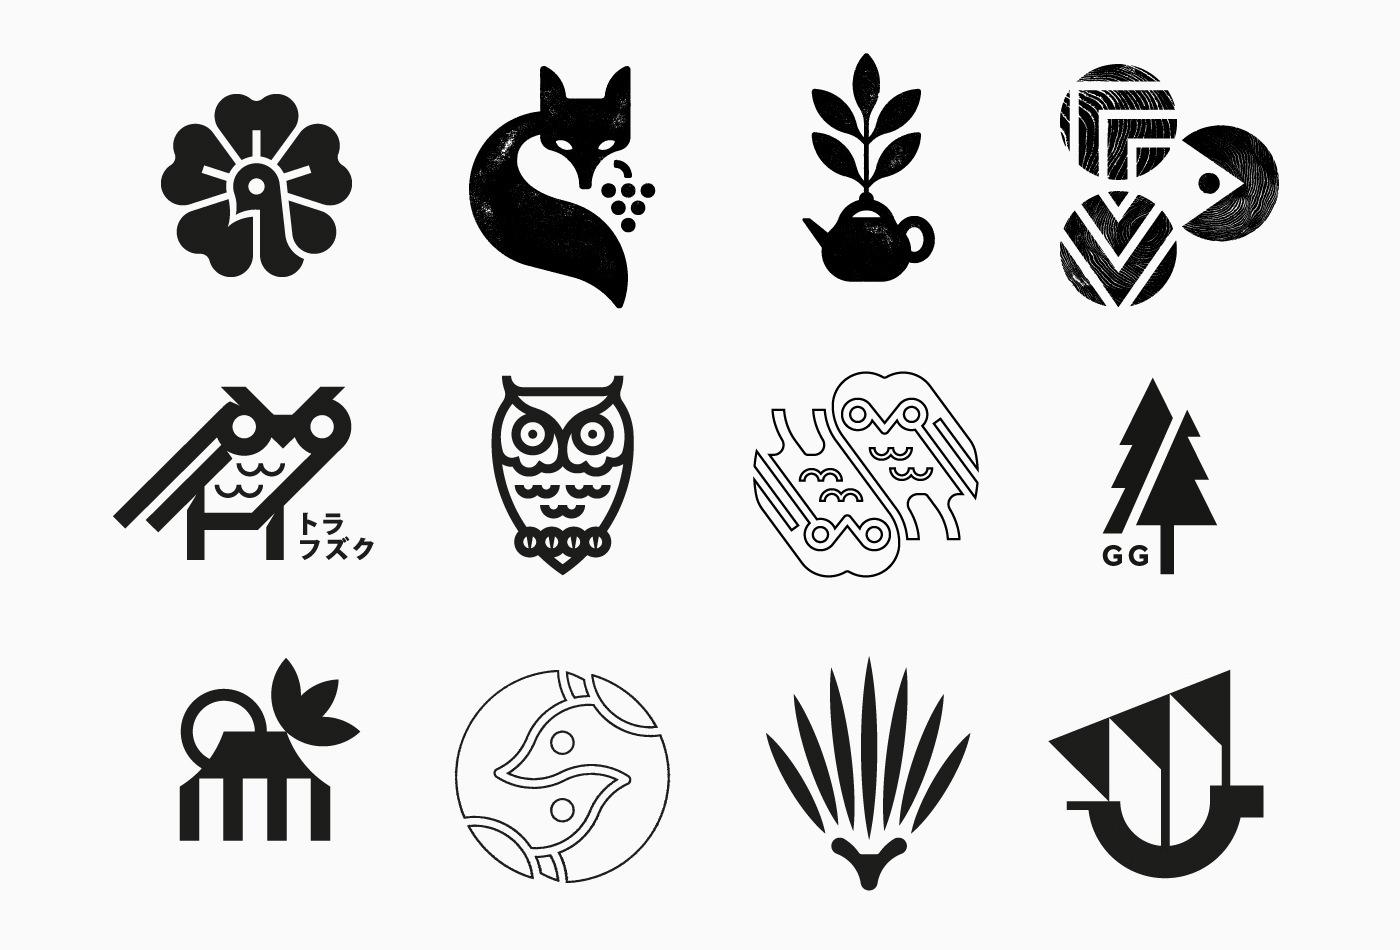 logomark-mark-logo-logos-logotype-brand-branding-pittogramma-vacaliebres-marks-pictograms-signs-picto-marks